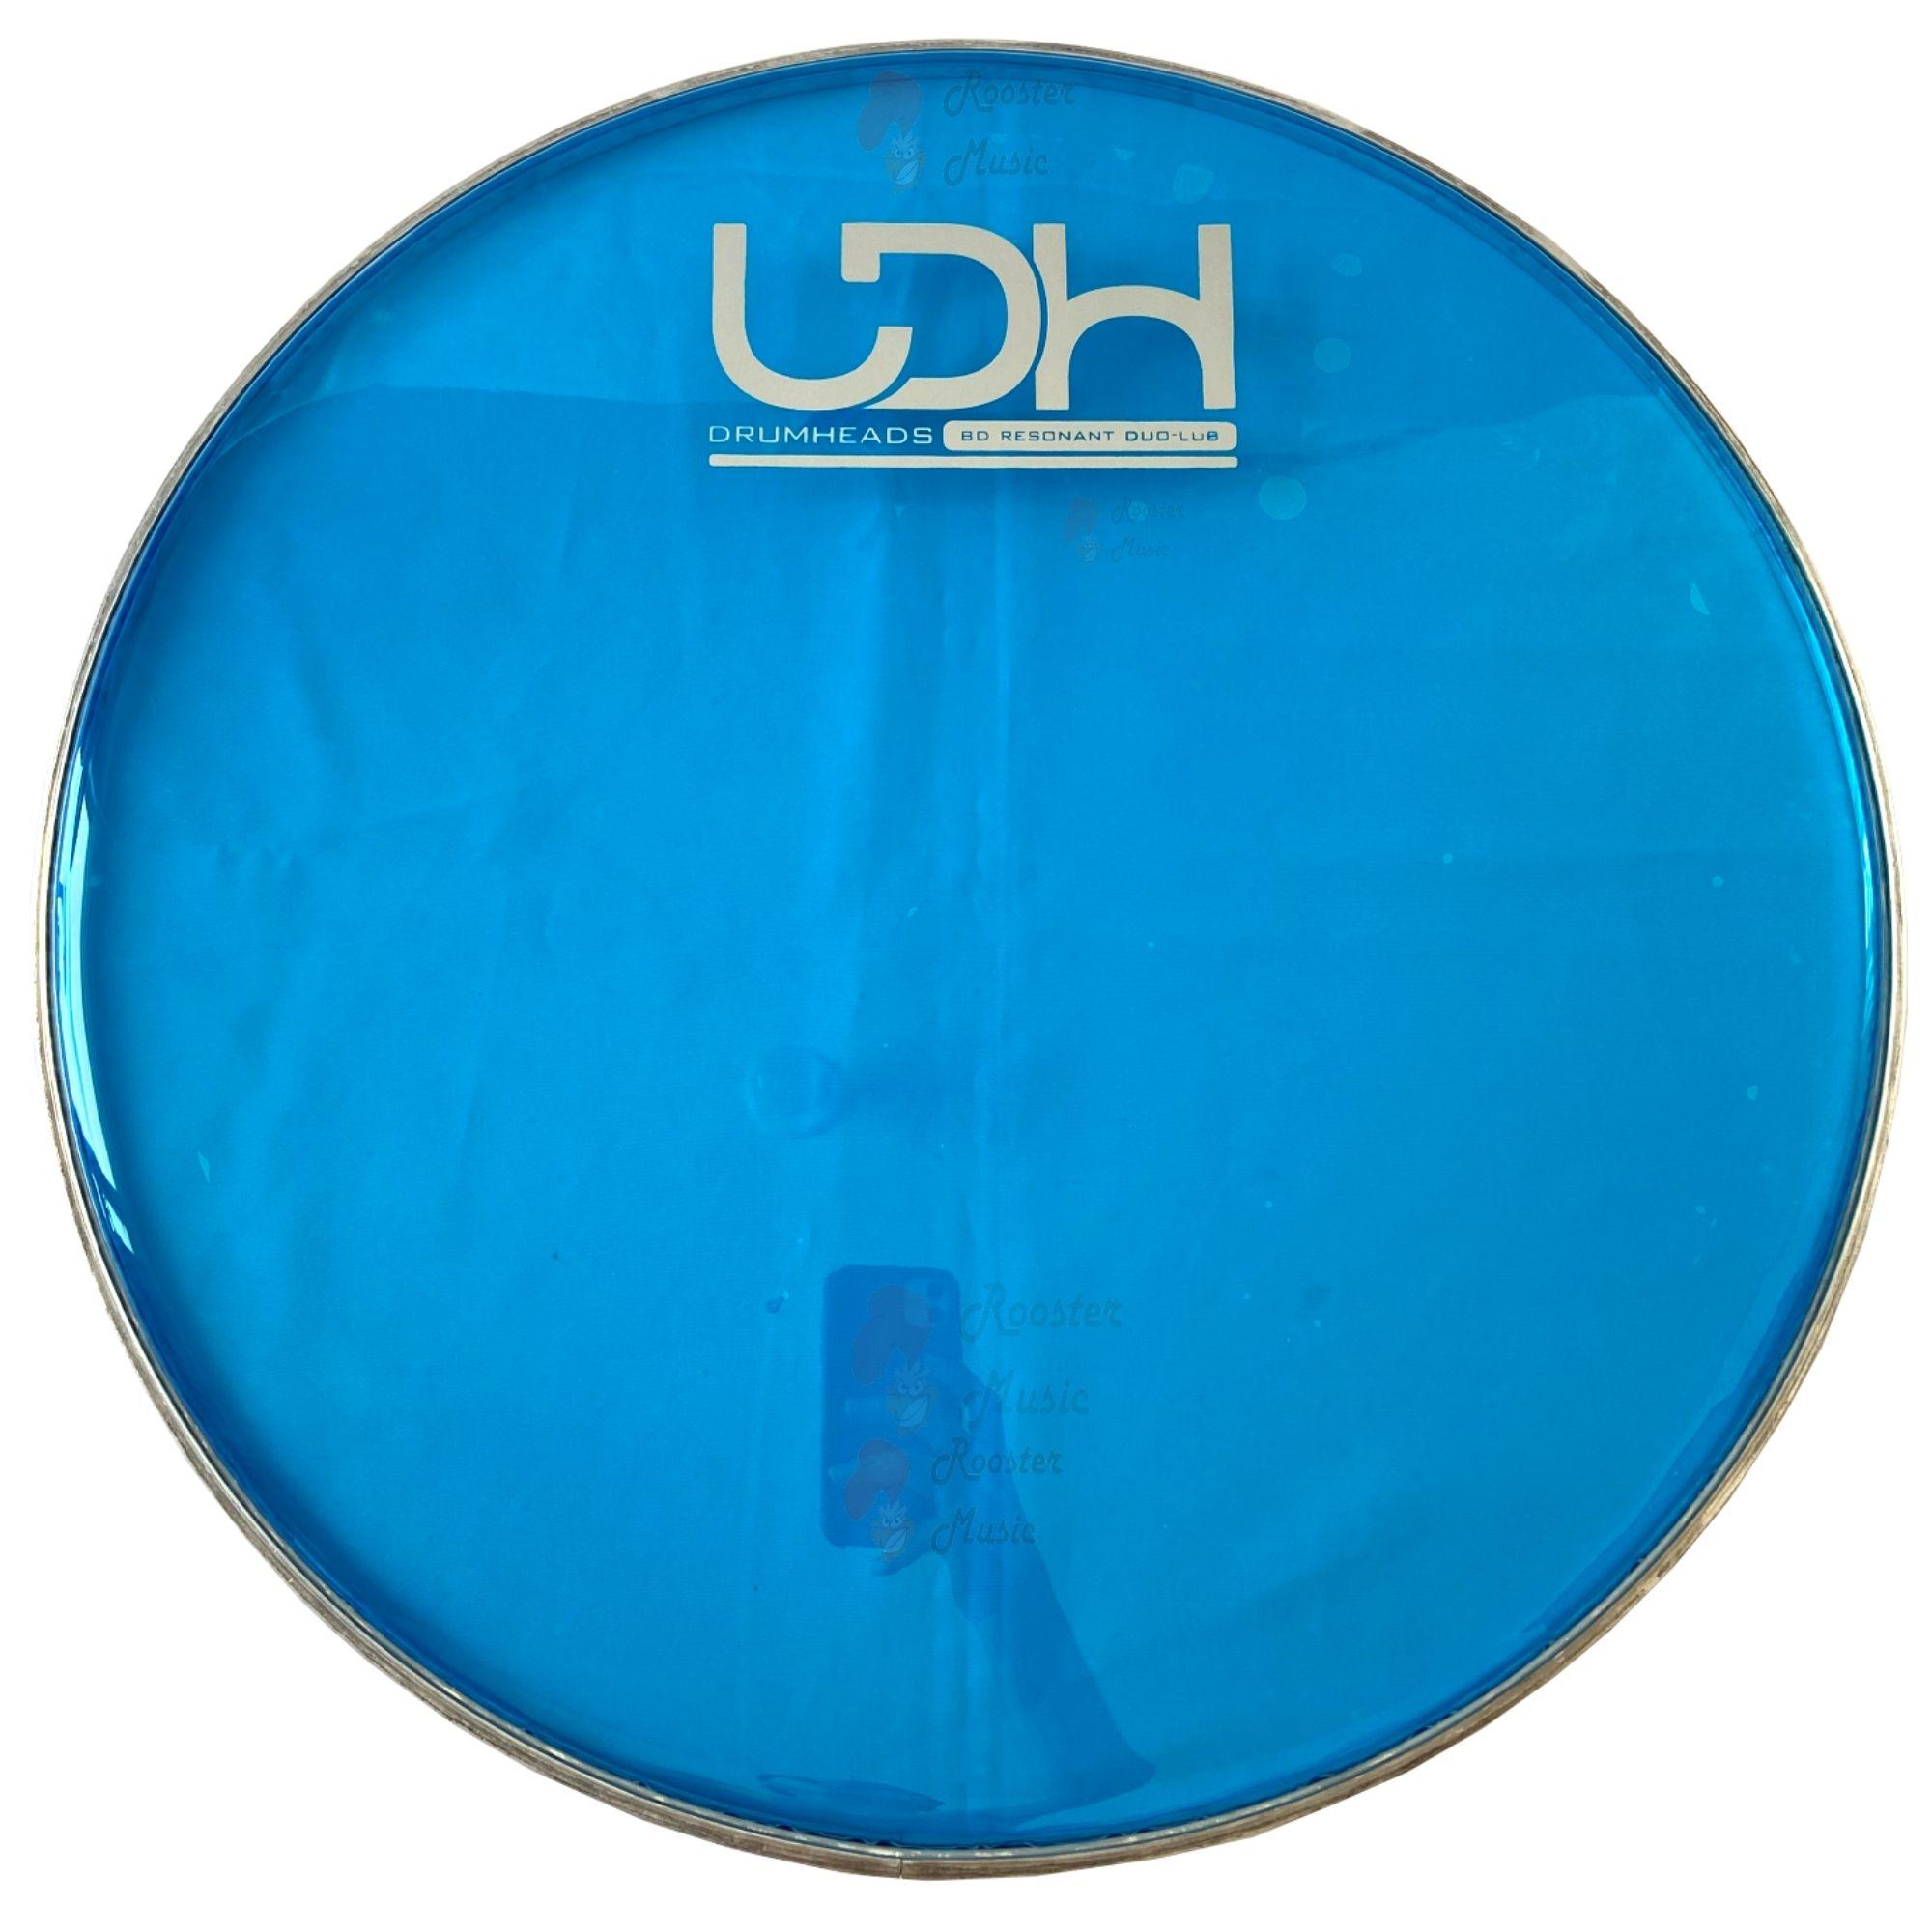 "Pele Hidráulica Duo Lub Clear Luen Drumheads LDH 13"" para Bateria."